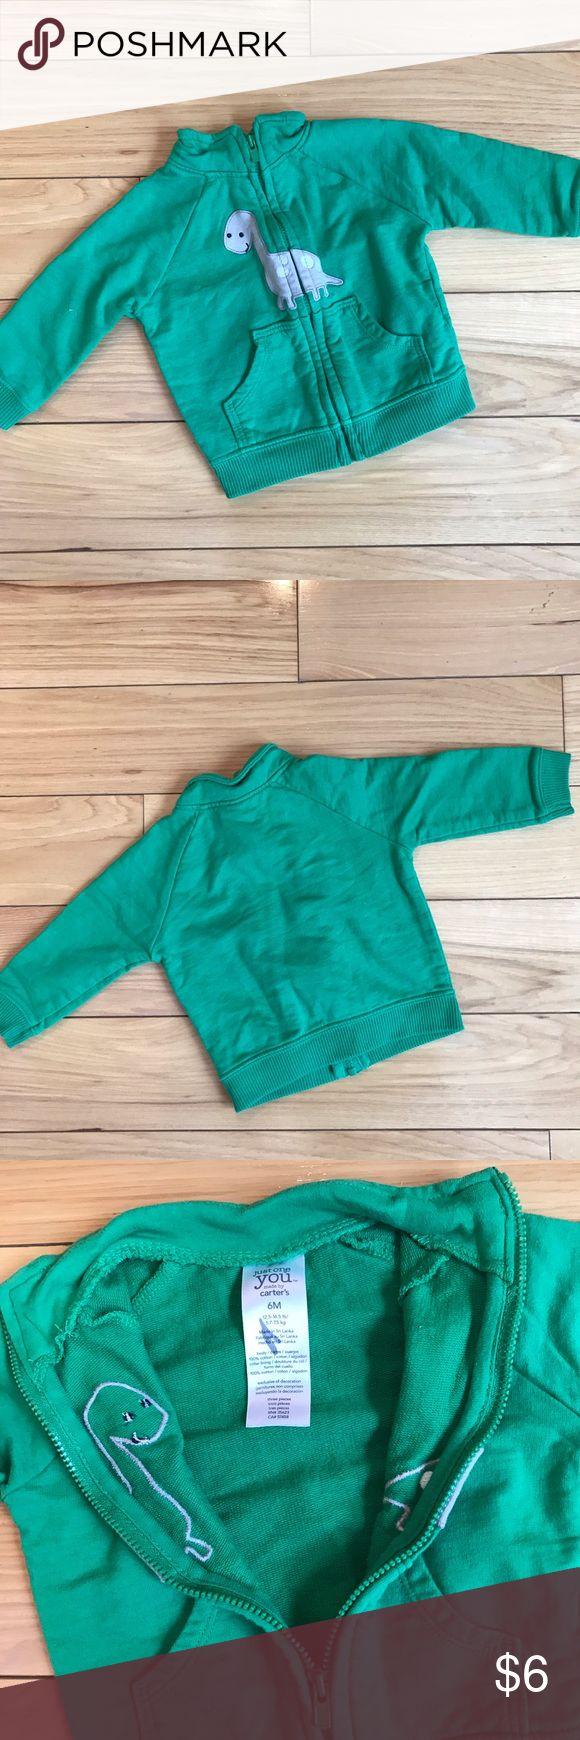 Carters Dinosaur Green Zip-up Sweatshirt Carters Green Dinosaur Zip up Sweatshirt. Excellent used condition. Size 6 months Carter's Shirts & Tops Sweatshirts & Hoodies